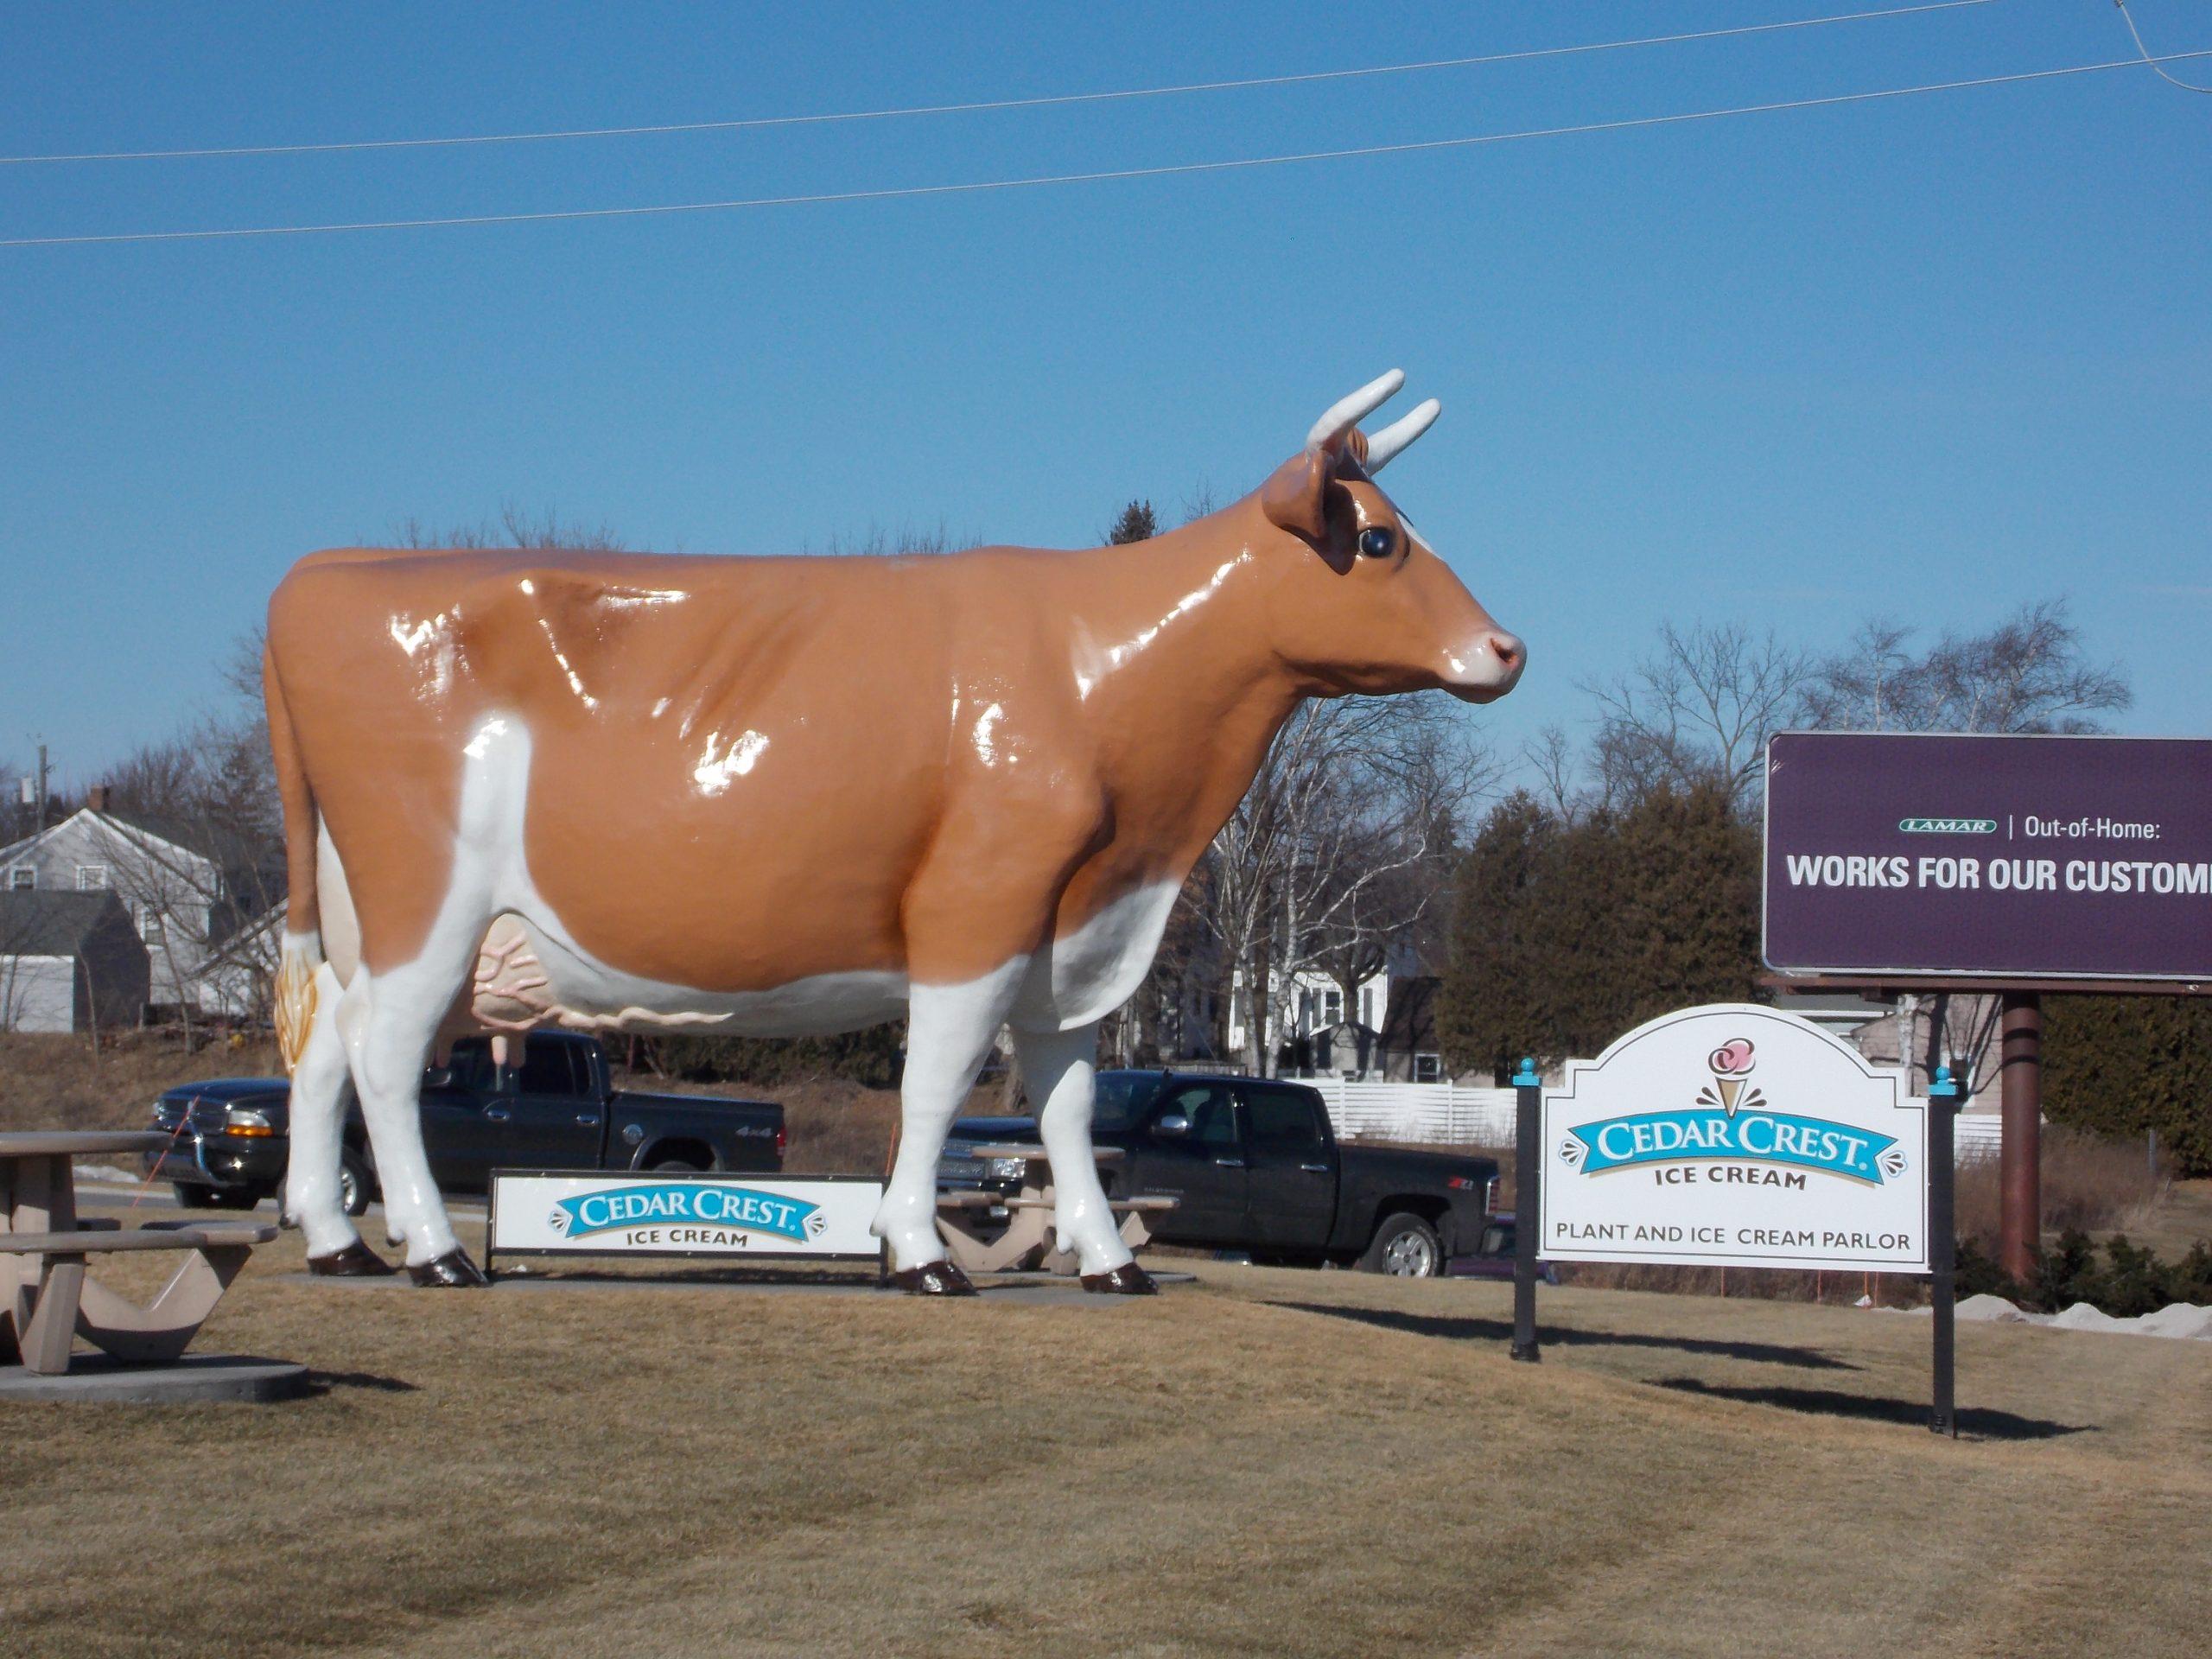 Cedar Crest - Cow.JPG